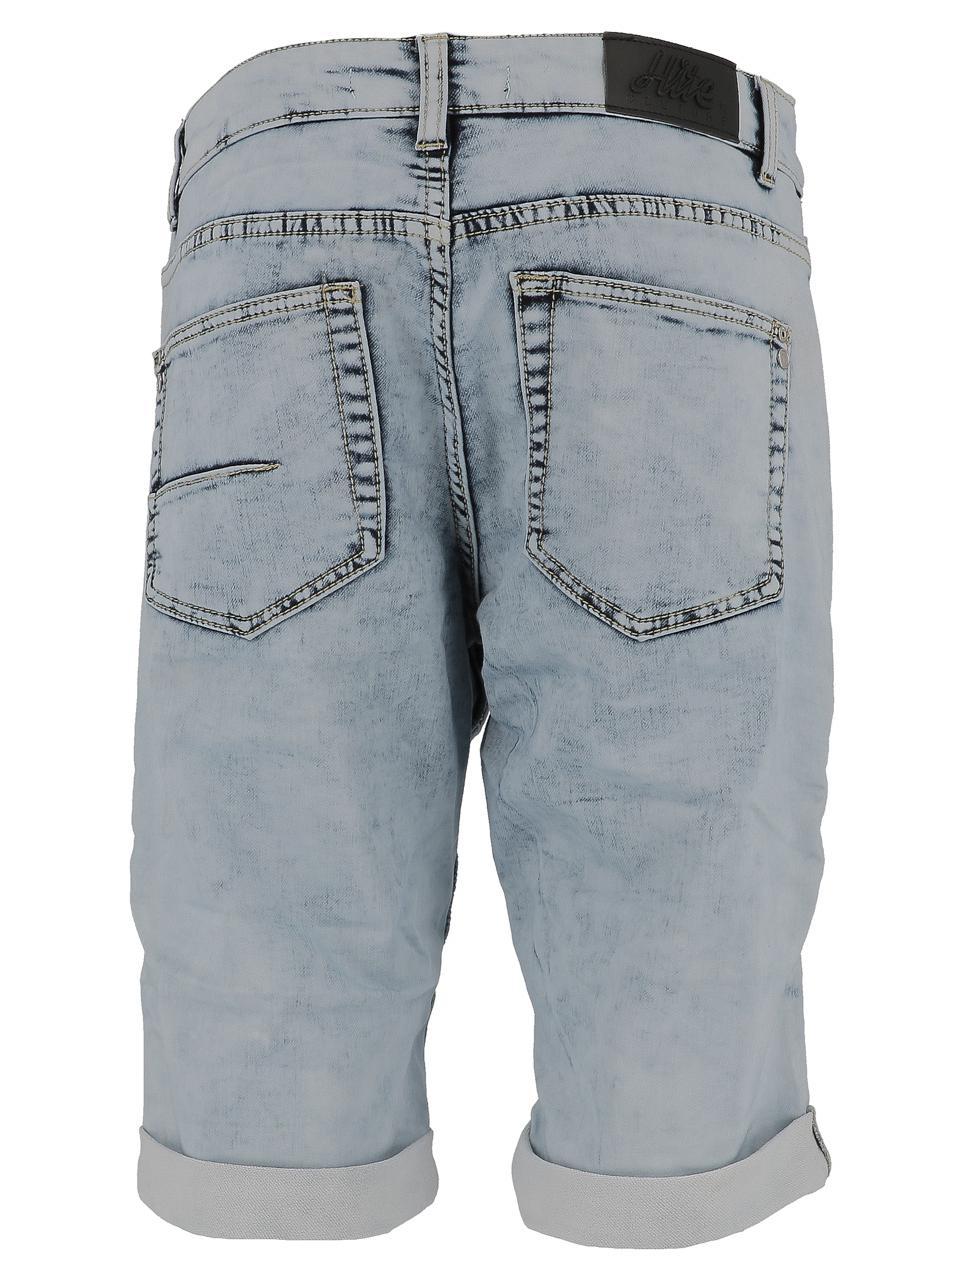 Bermuda-Shorts-Hite-Couture-Spill-Denim-Blue-Bermuda-Blue-11588-New thumbnail 5